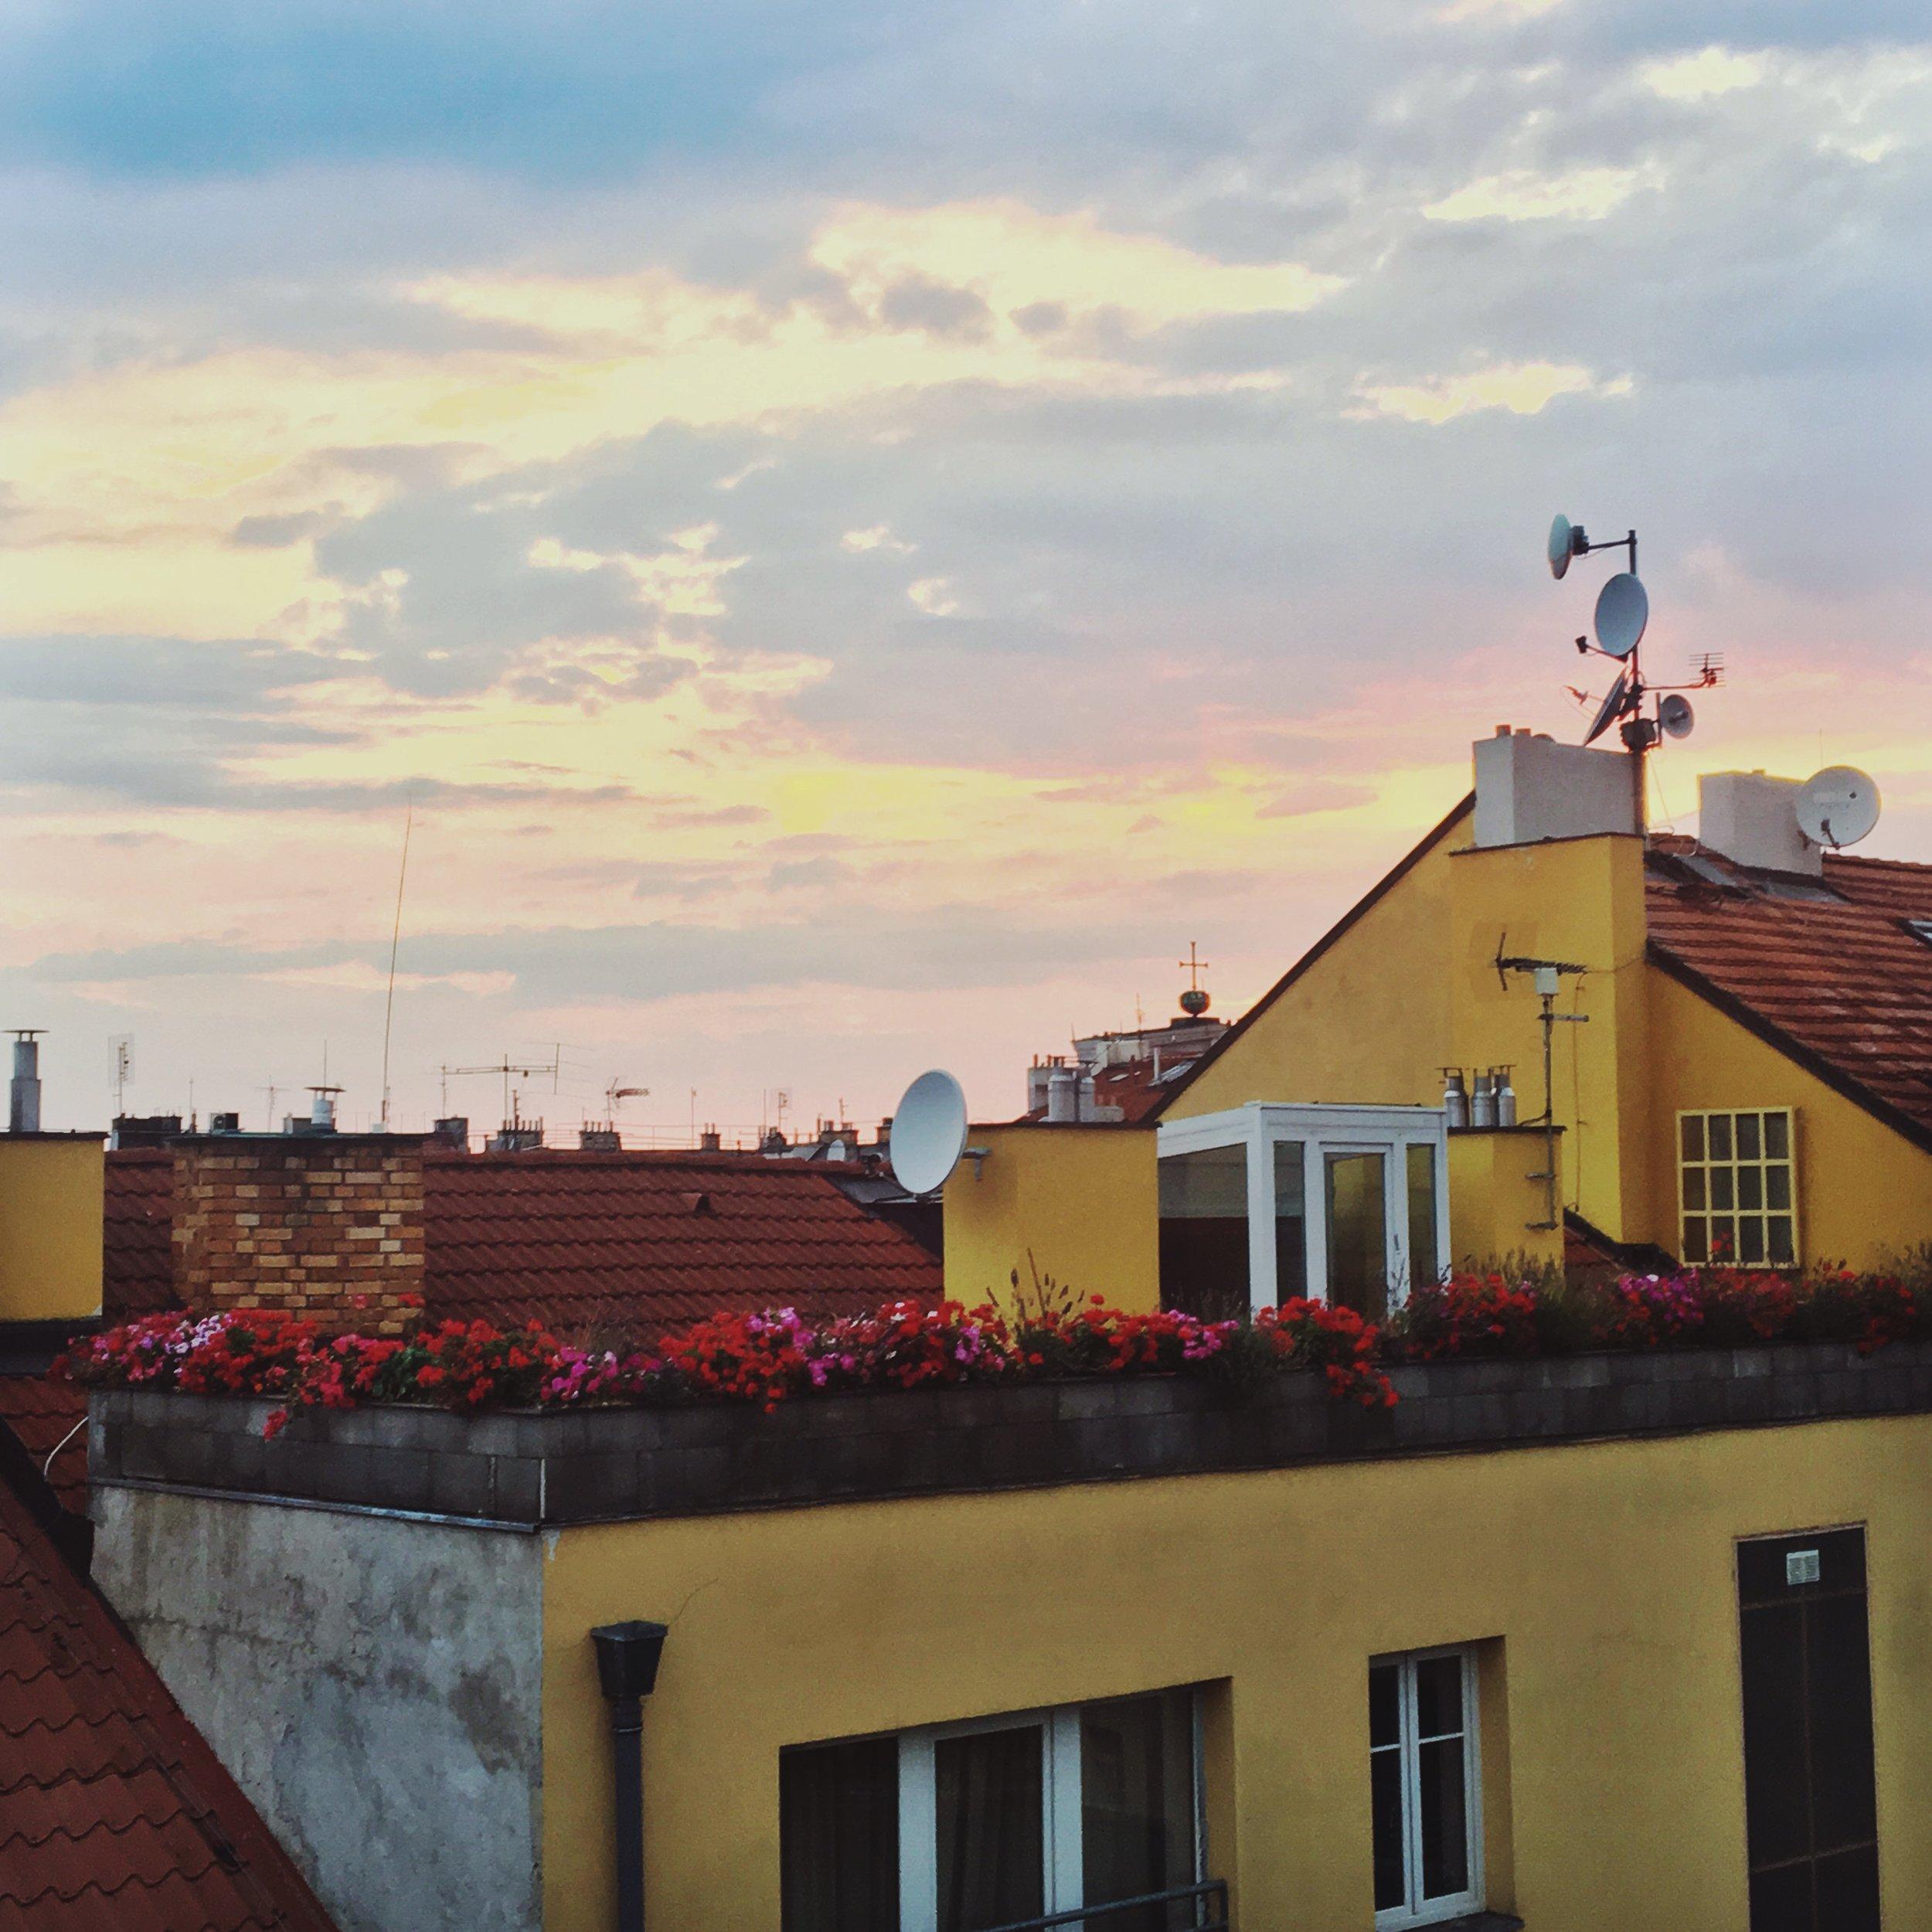 Sunset from Slezska 61 | Home sweet home